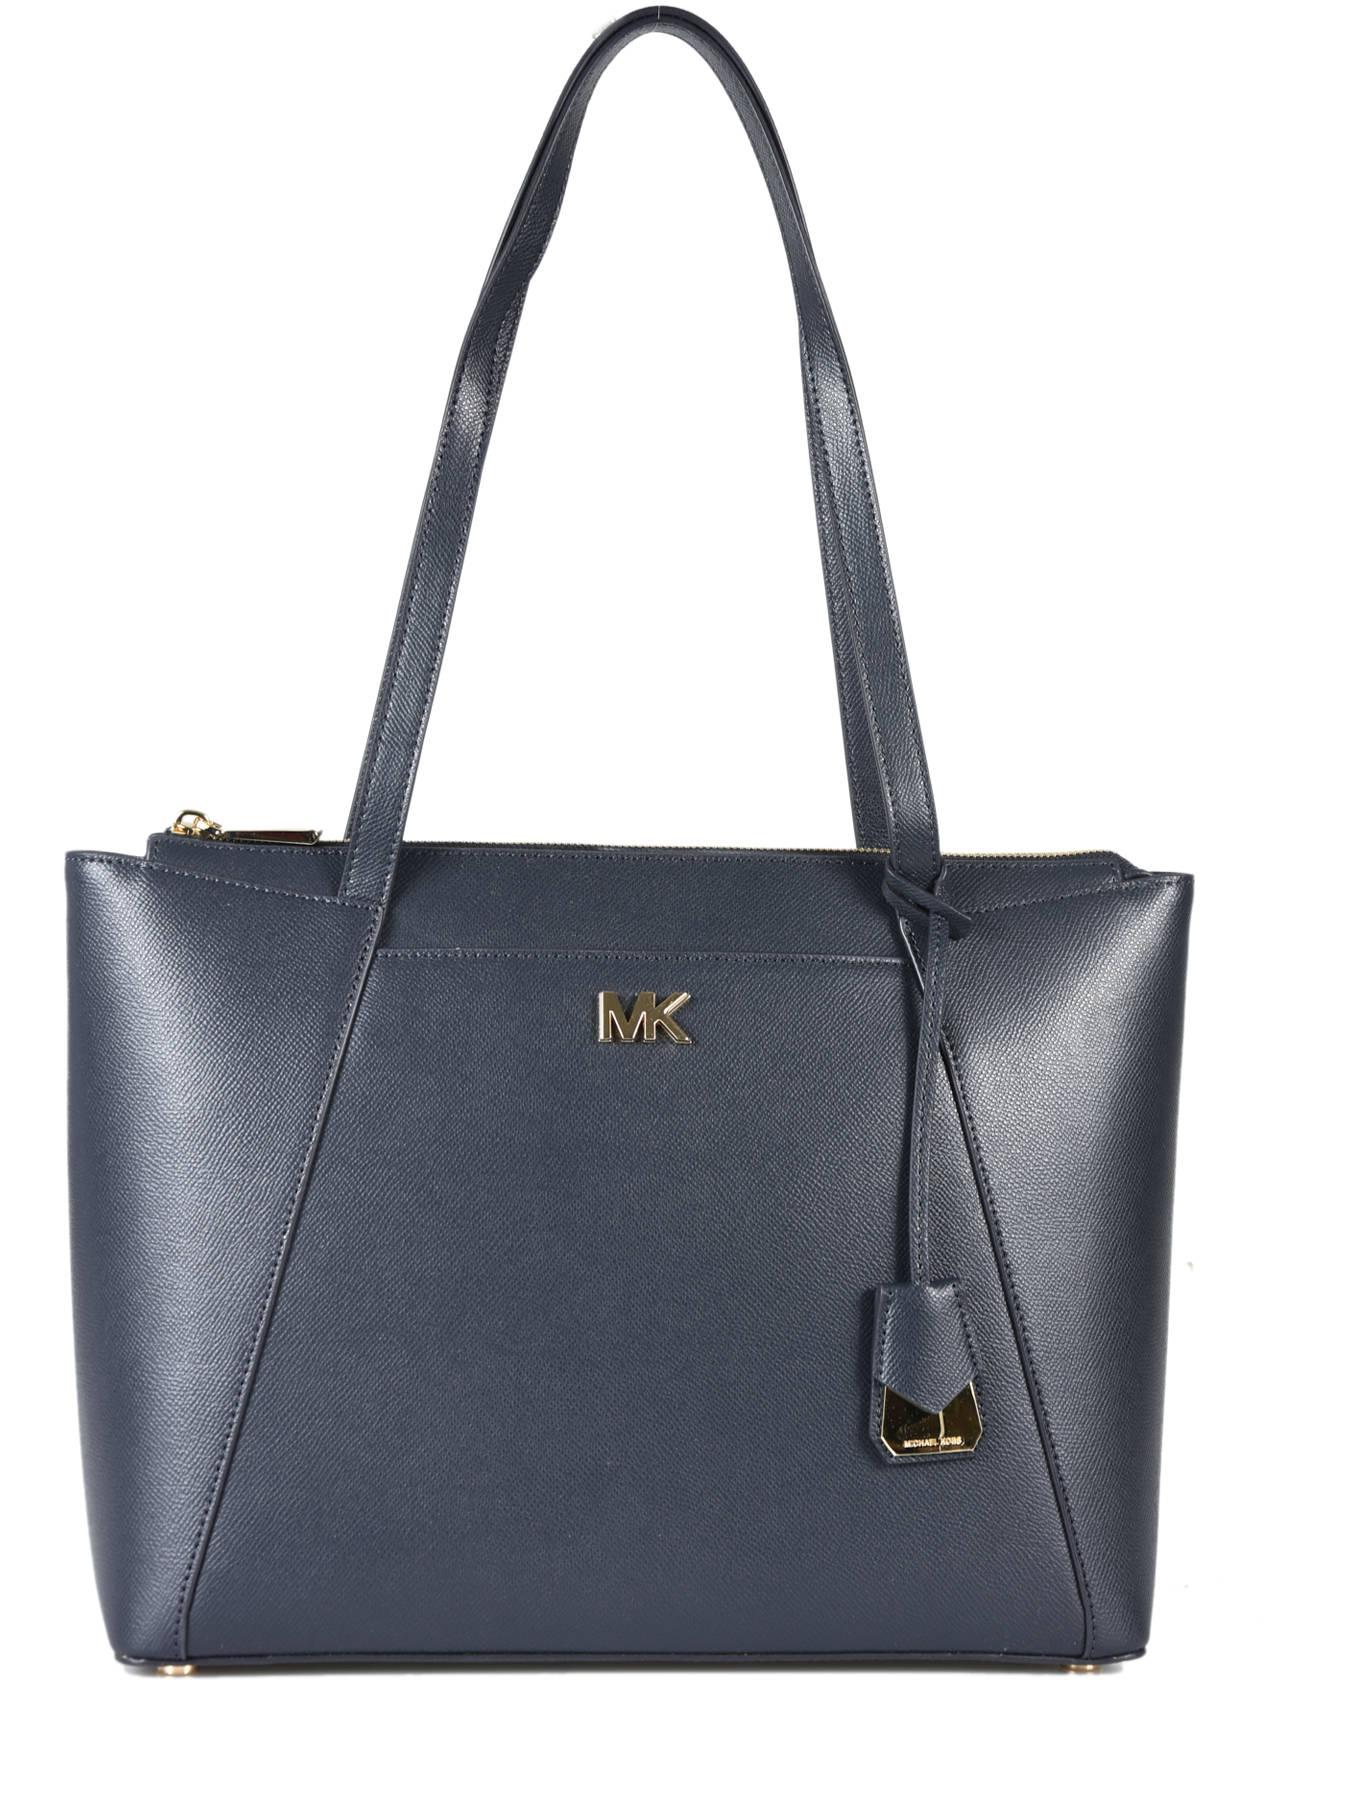 fe8cabe54b1f ... Shoulder Bag Maddie Leather Michael kors Blue maddie S8GN2T2L ...